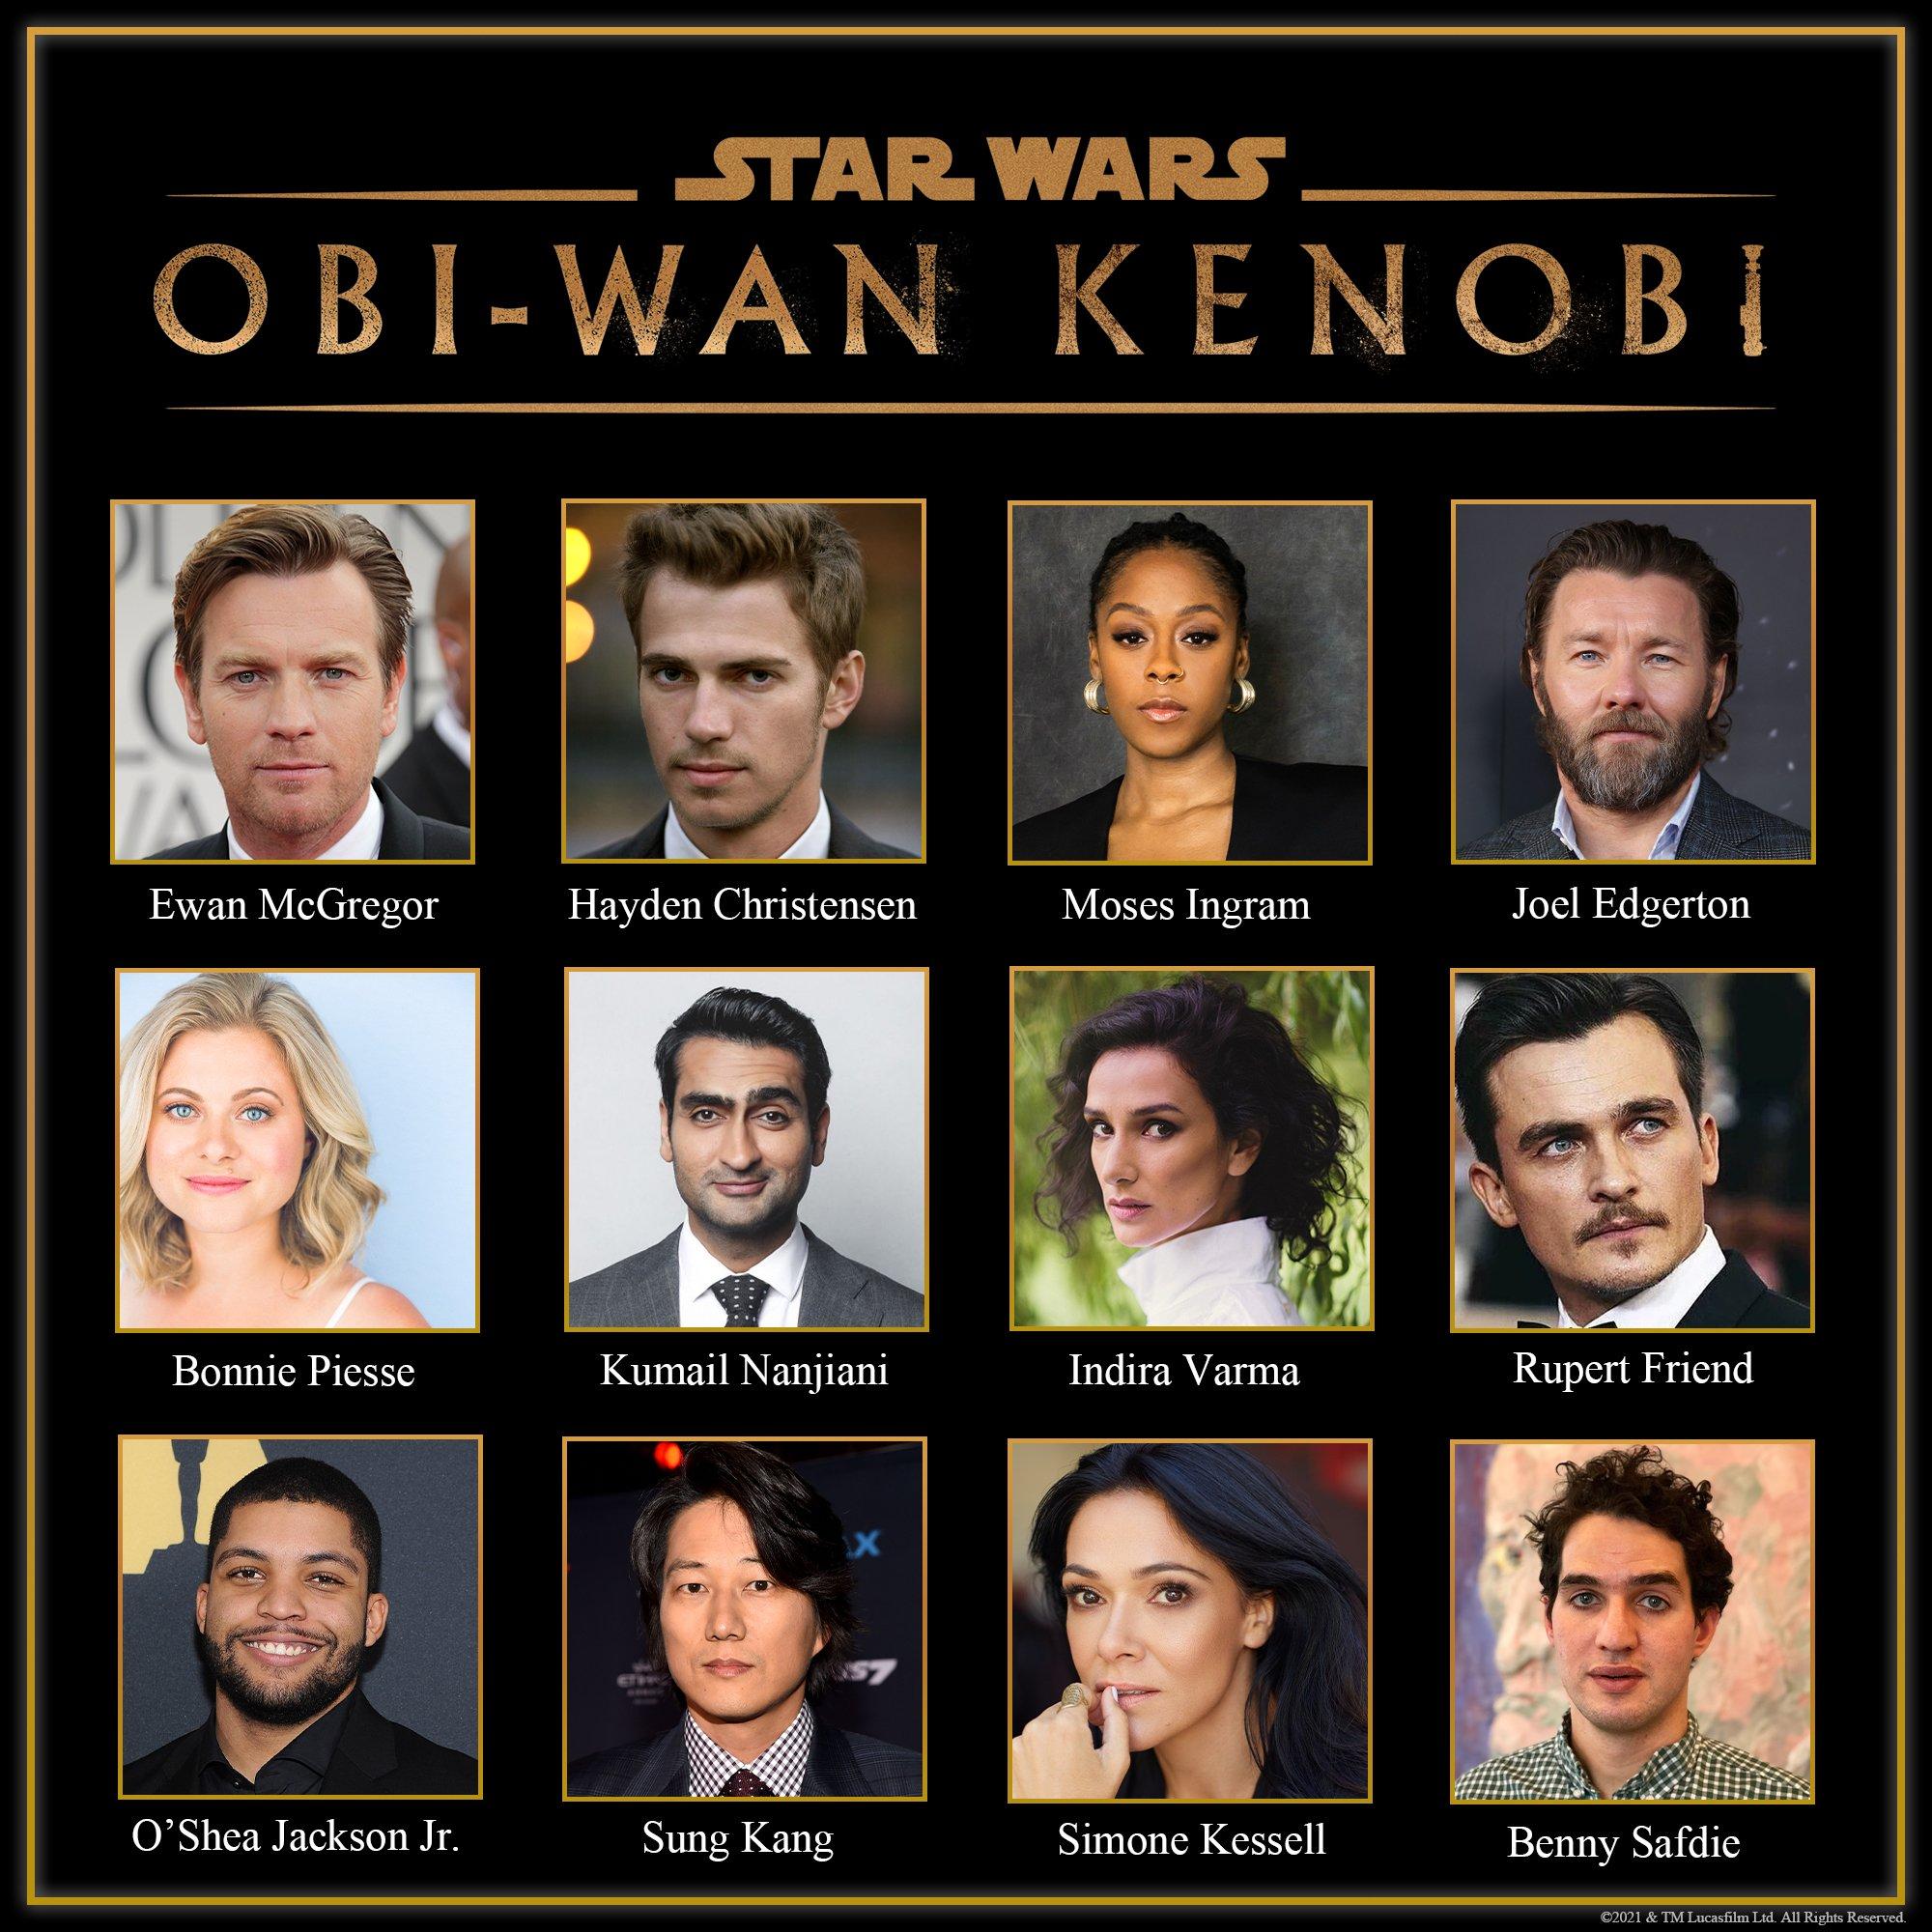 Star Wars : Obi-Wan Kenobi [Lucasfilm - 202?] - Page 4 ExpvhlcXMAscb6q?format=jpg&name=large